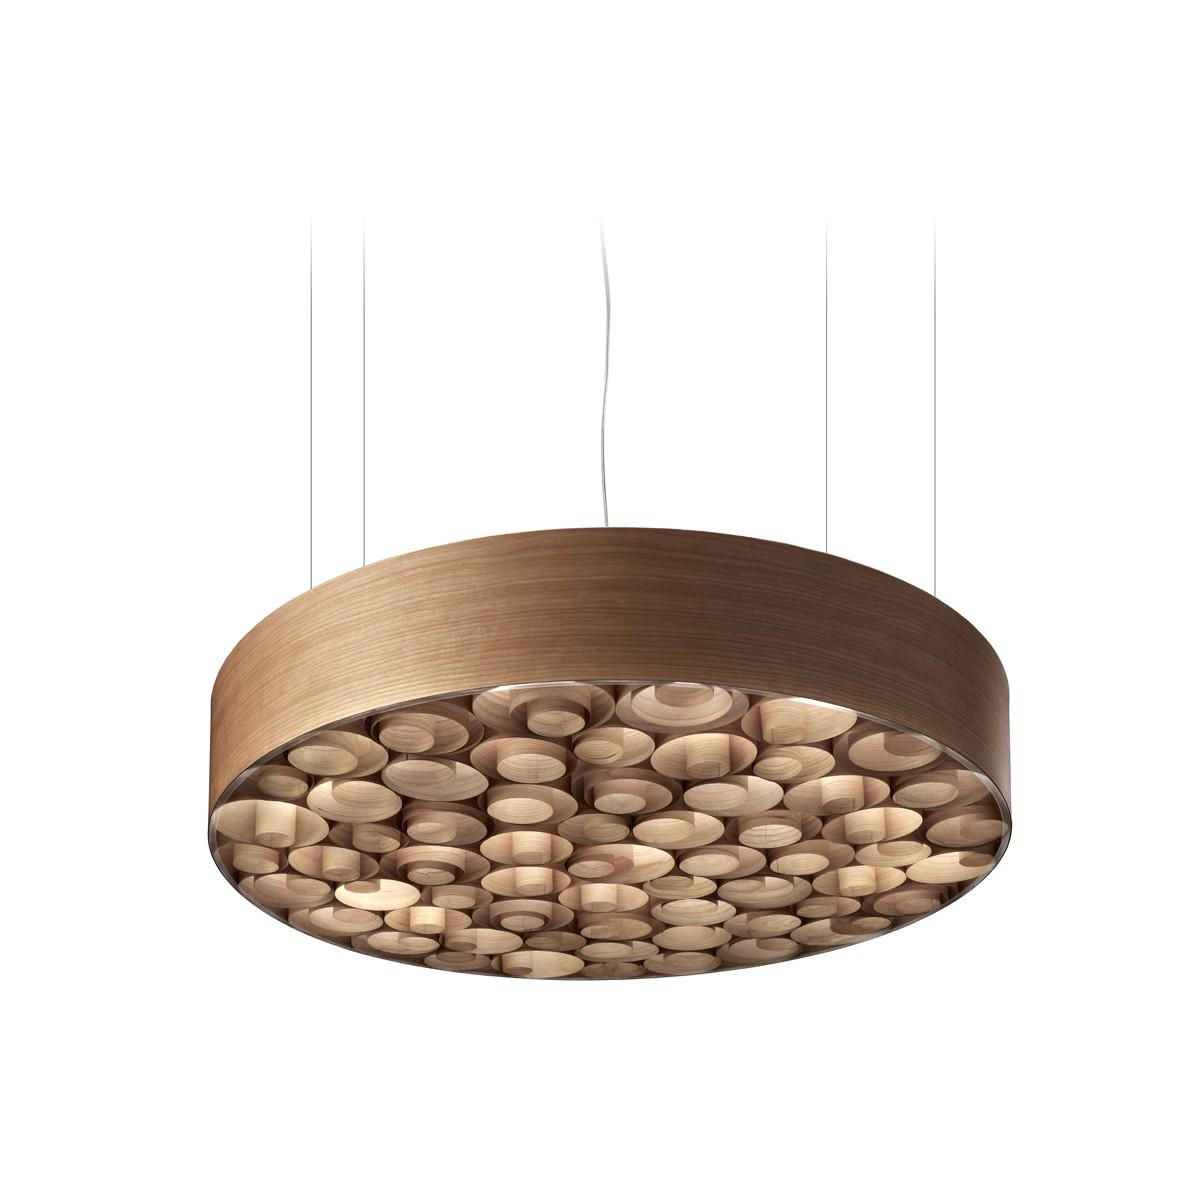 LZF Lamps Spiro Medium LED Pendelleuchte, äußerer Schirm: Kirsche, innen: Kirsche